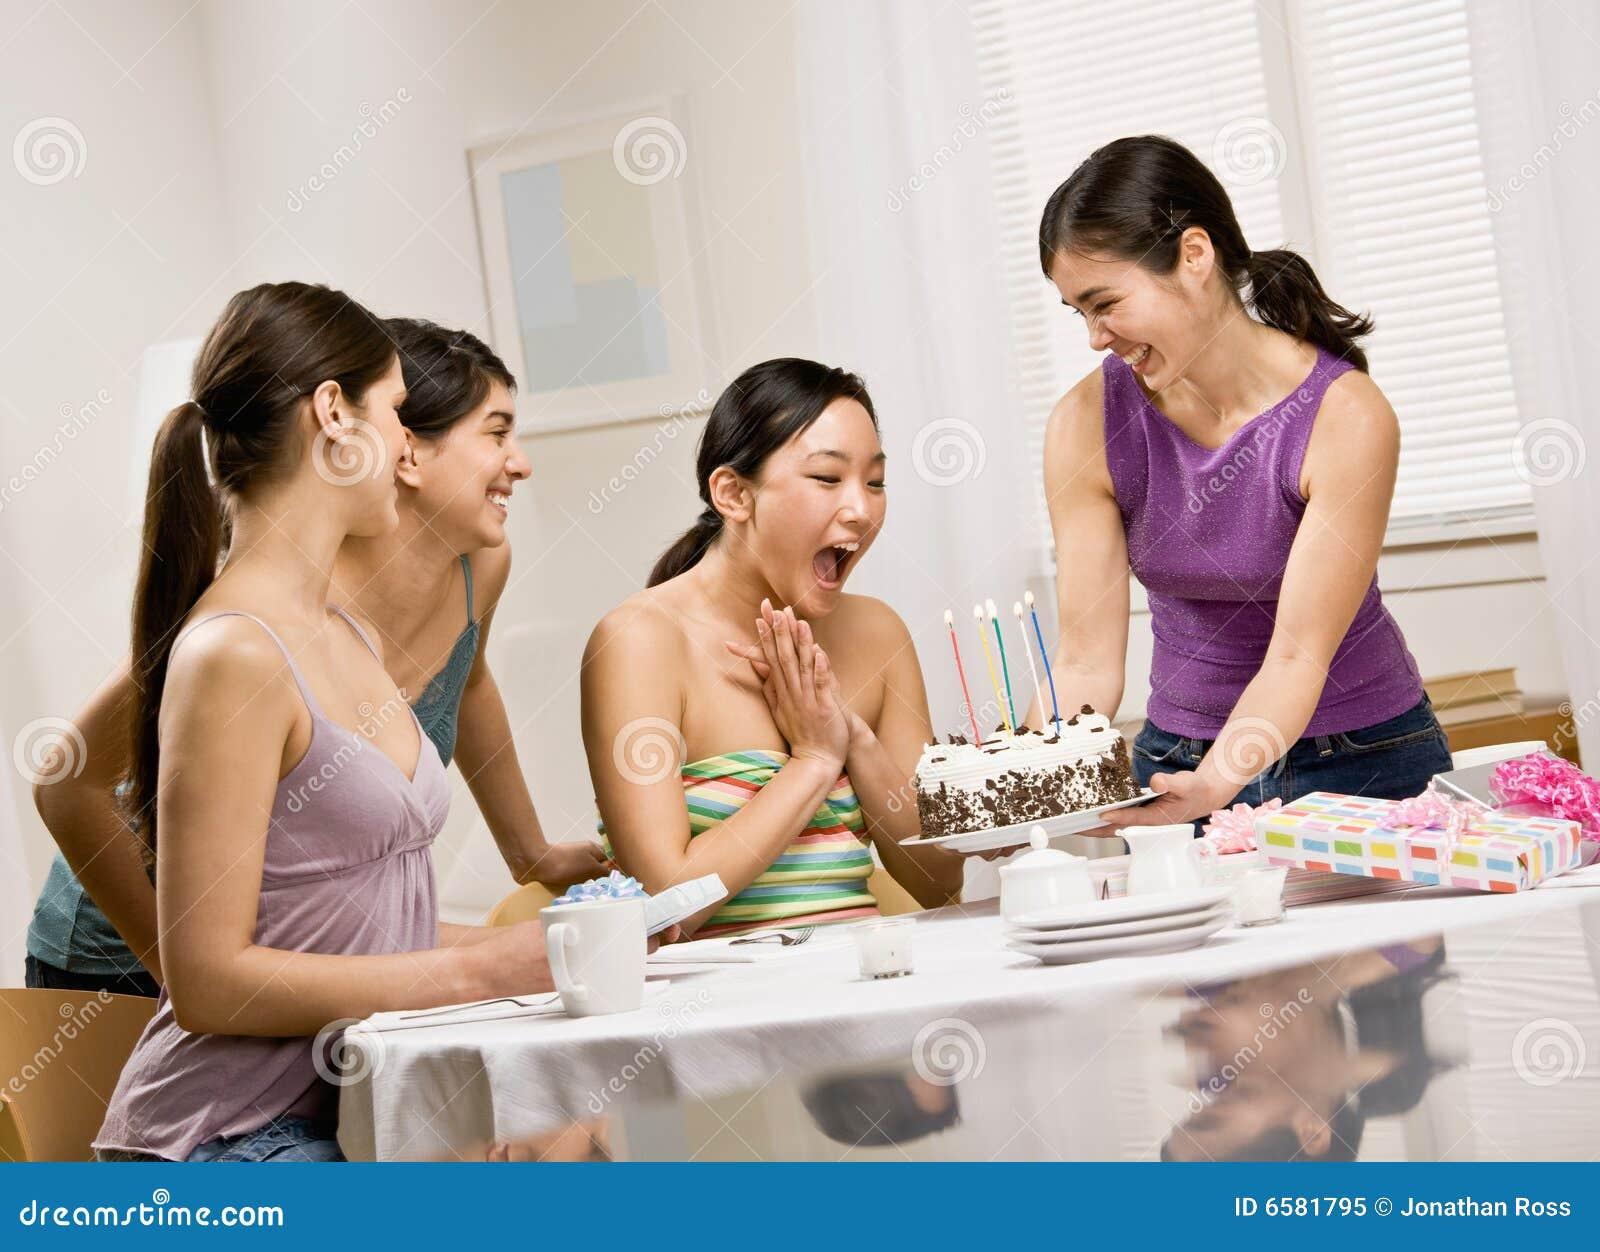 Woman surprising friend with birthday cake